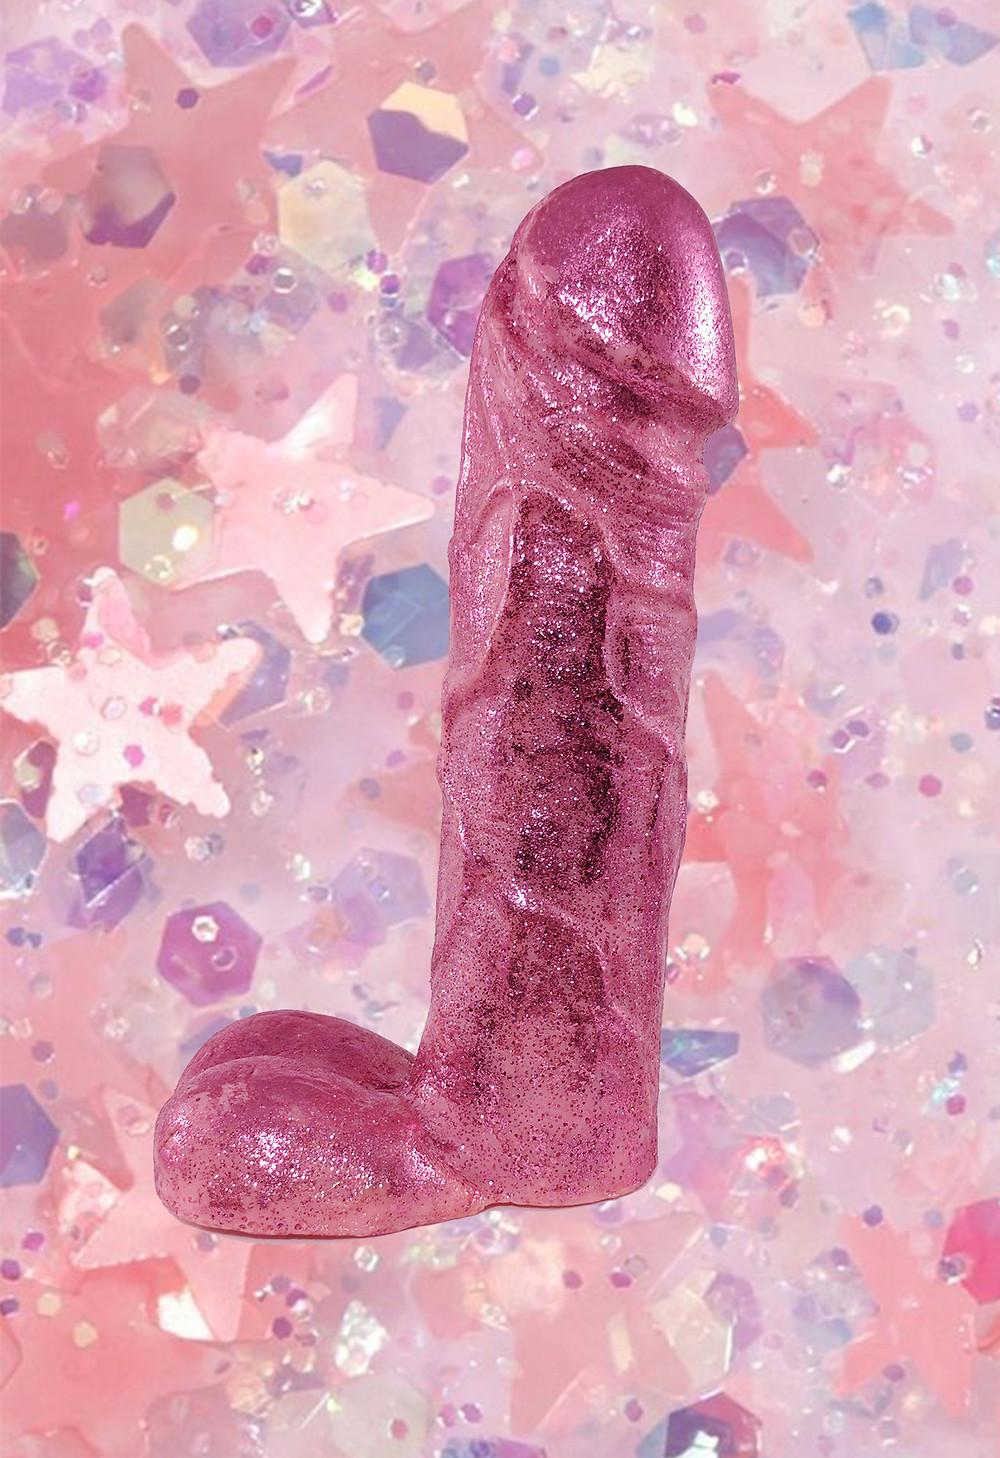 VAGINA, soap, vagina soap, pussy soap, vulva, glitter, hester street hair, howl magazine, howl mag, julia de la torre, fun, kitsch, gift, penis, dildo, penis soap, glitter, pink, beautiful, amazing,